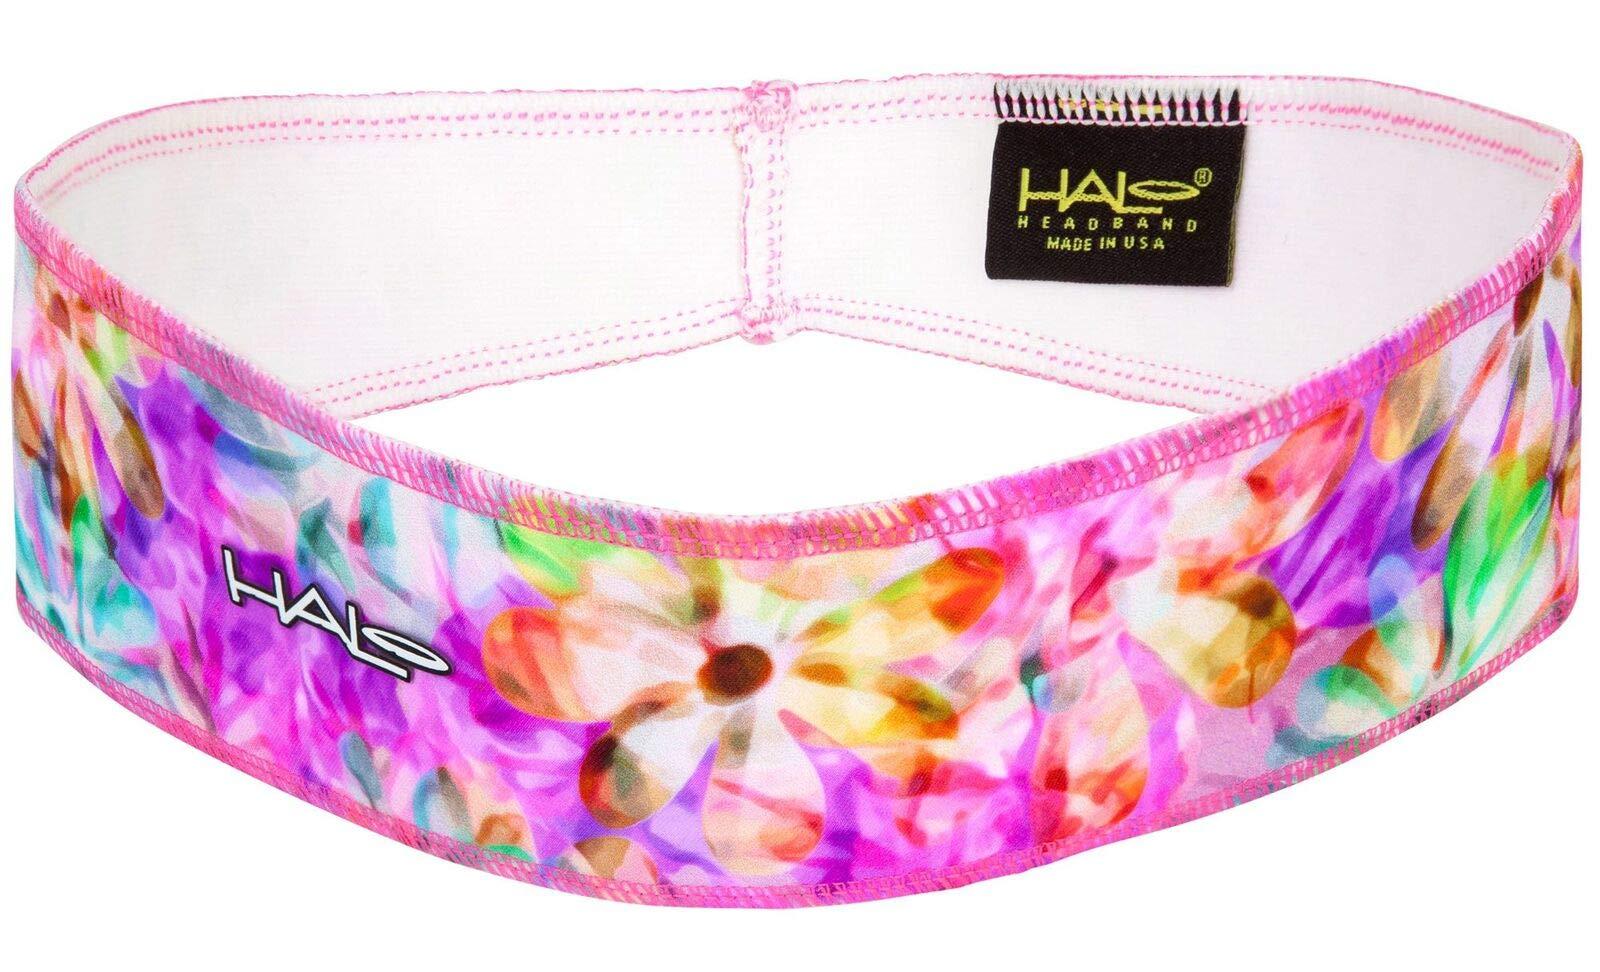 Halo II Headband Sweatband Pullover, Blur by Halo Headbands